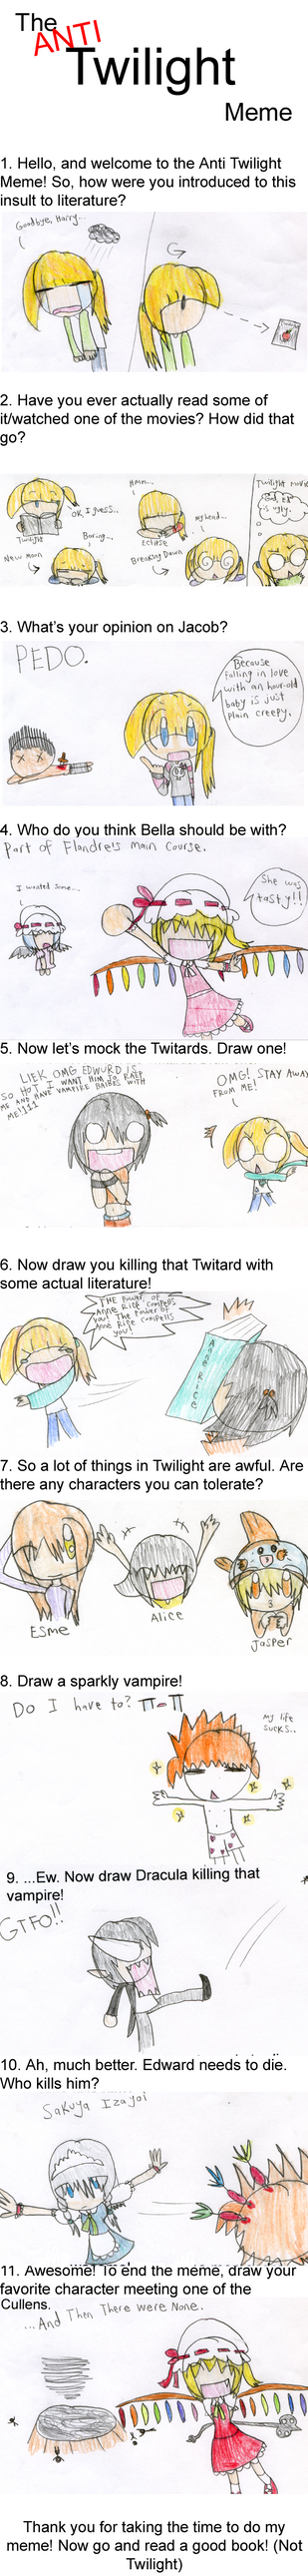 Anti-Twilight Meme- Tobi v. by TobiObito4ever